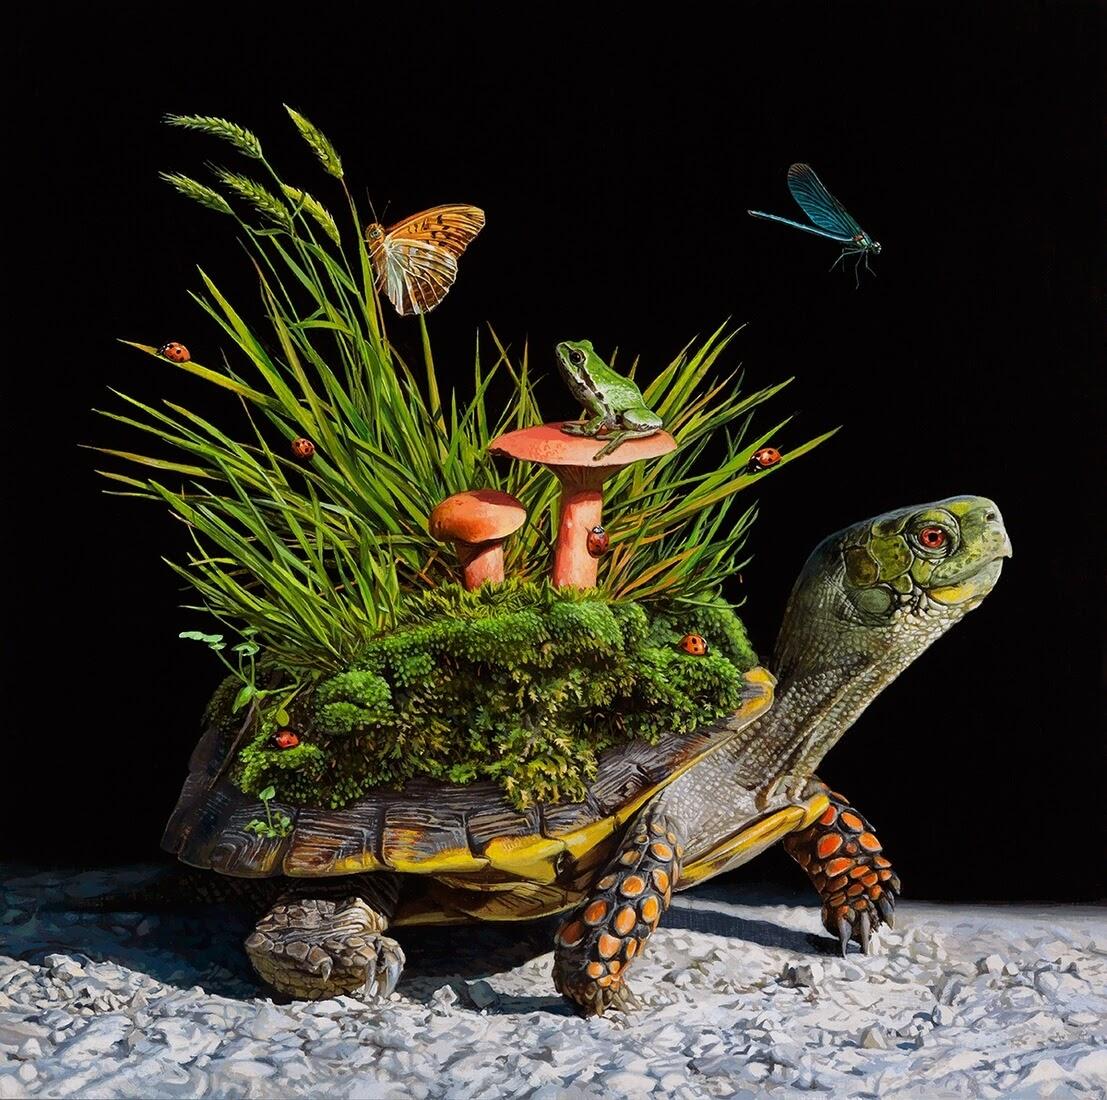 08-Terrarium-Lisa-Ericson-Animals-Interspecies-Friendships-Paintings-www-designstack-co